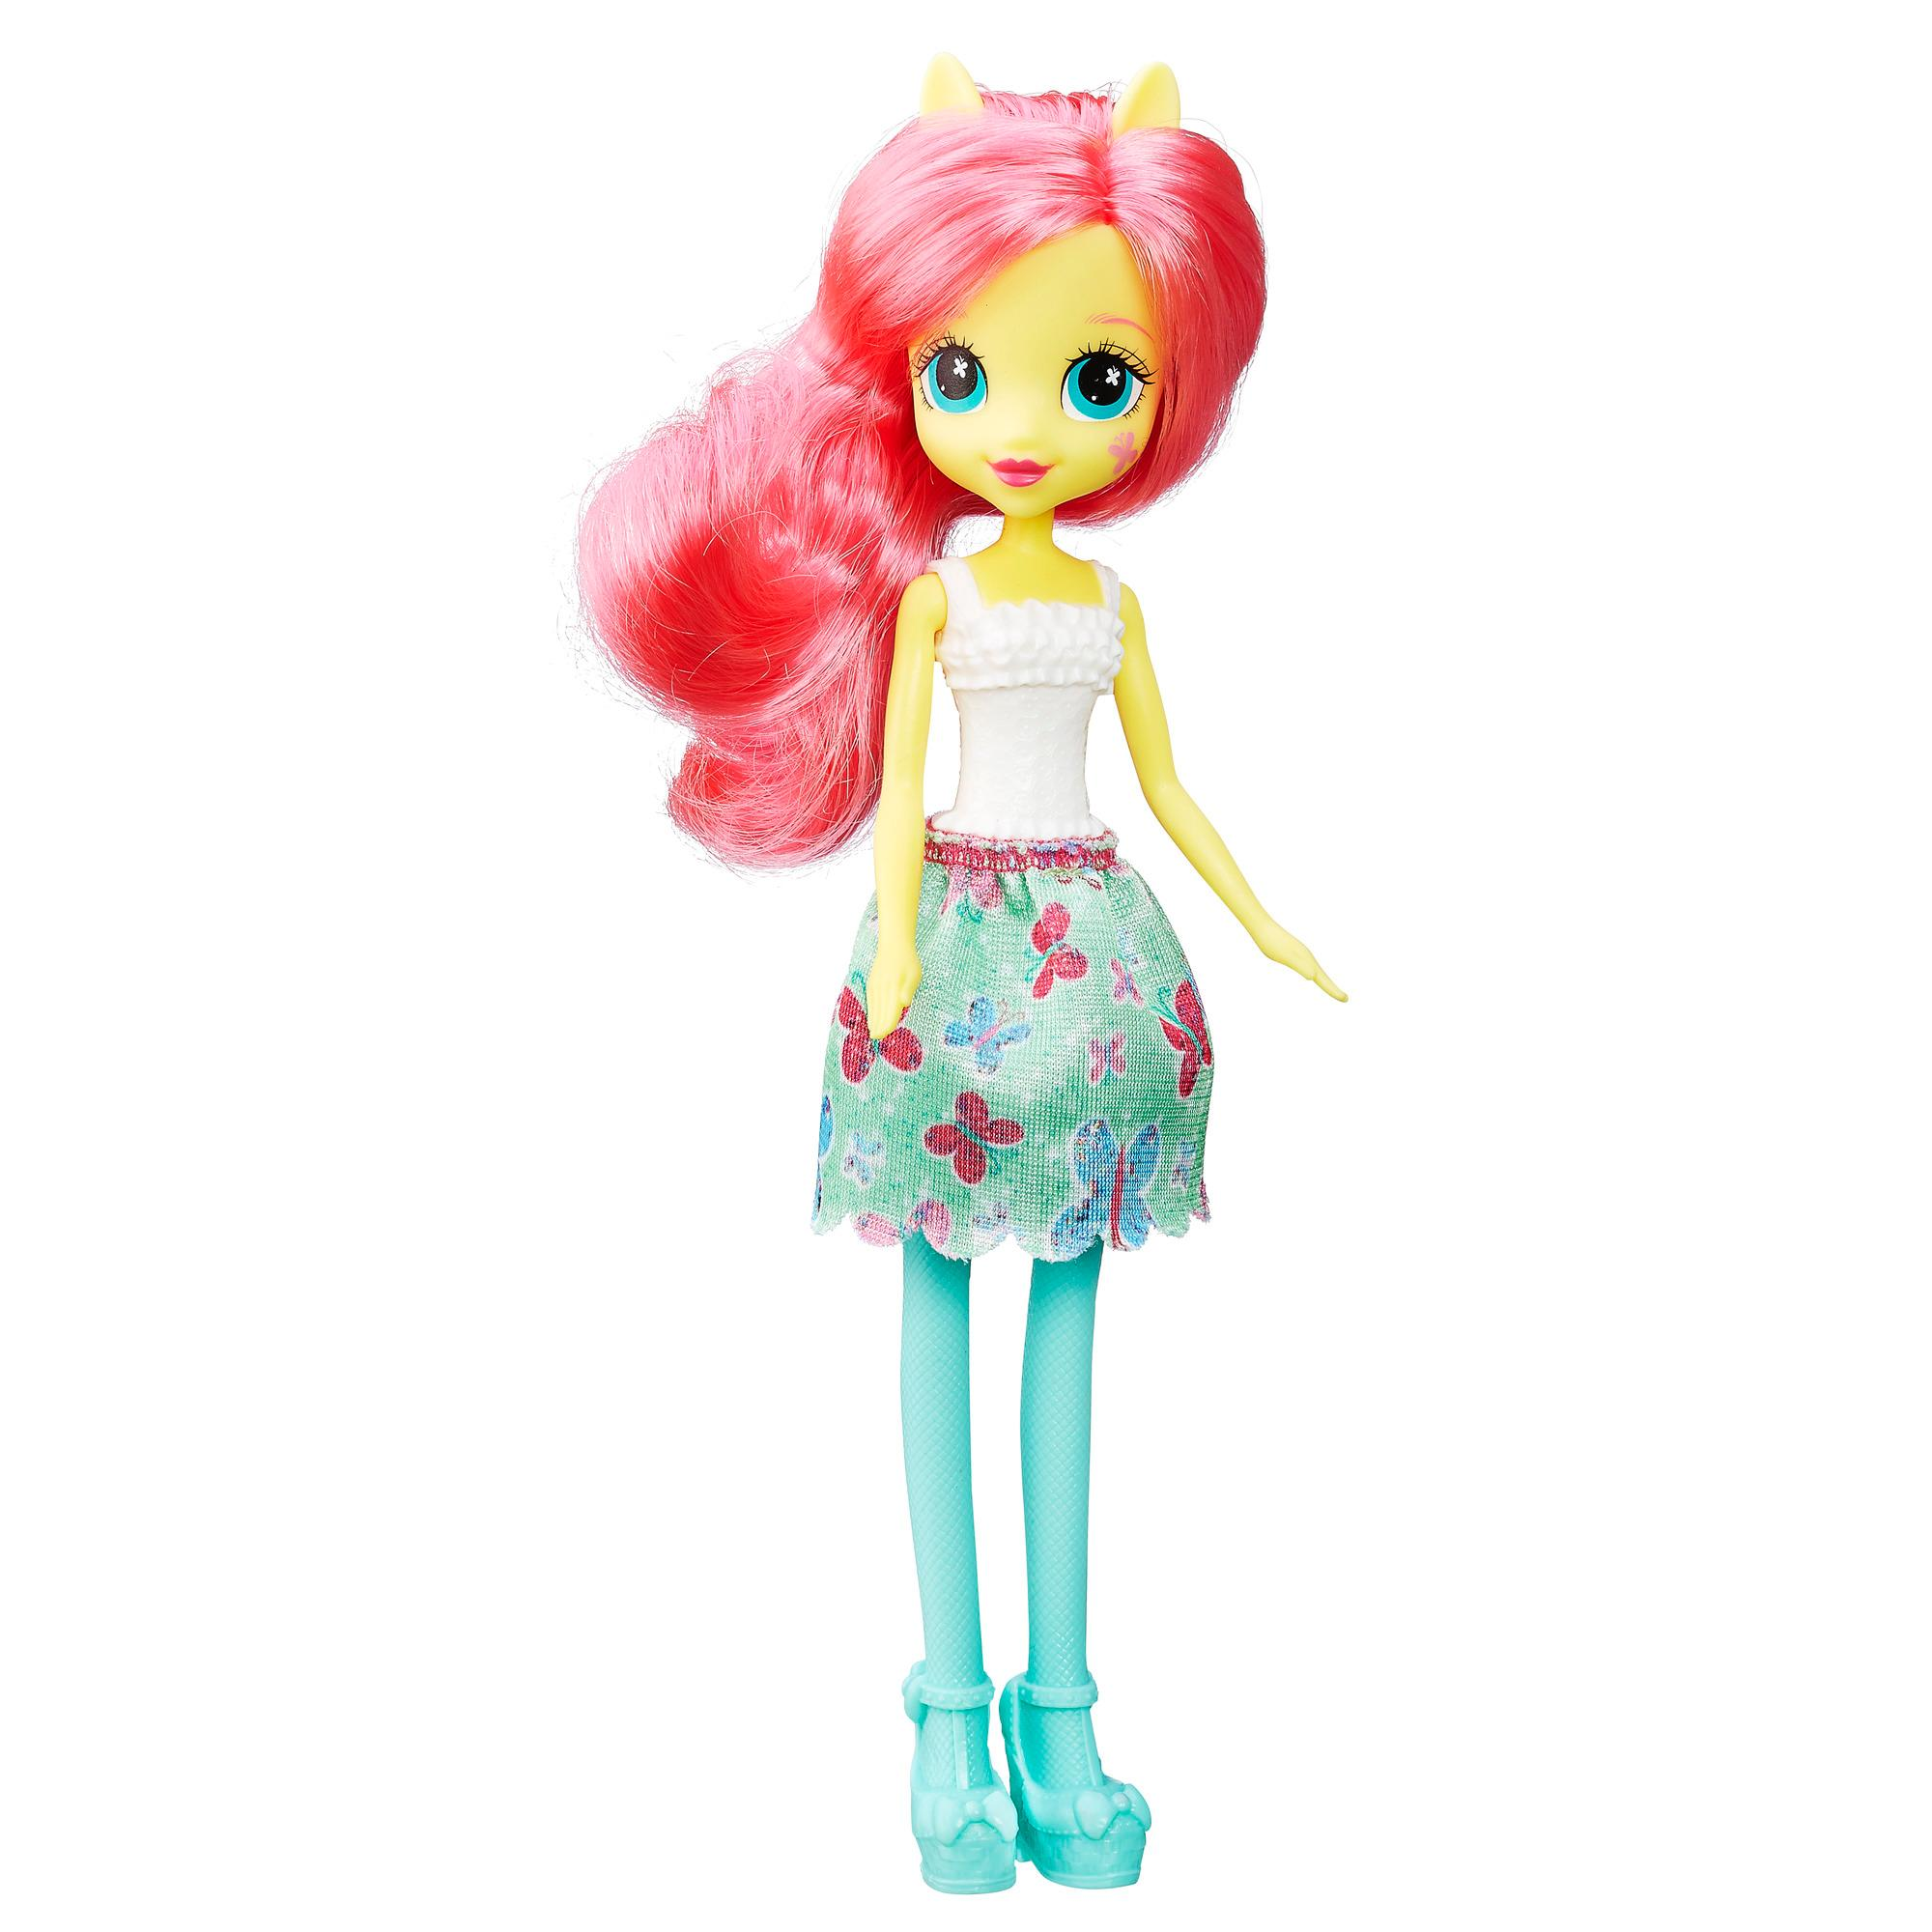 My Little Pony Equestria Girls Fluttershy Basic Doll